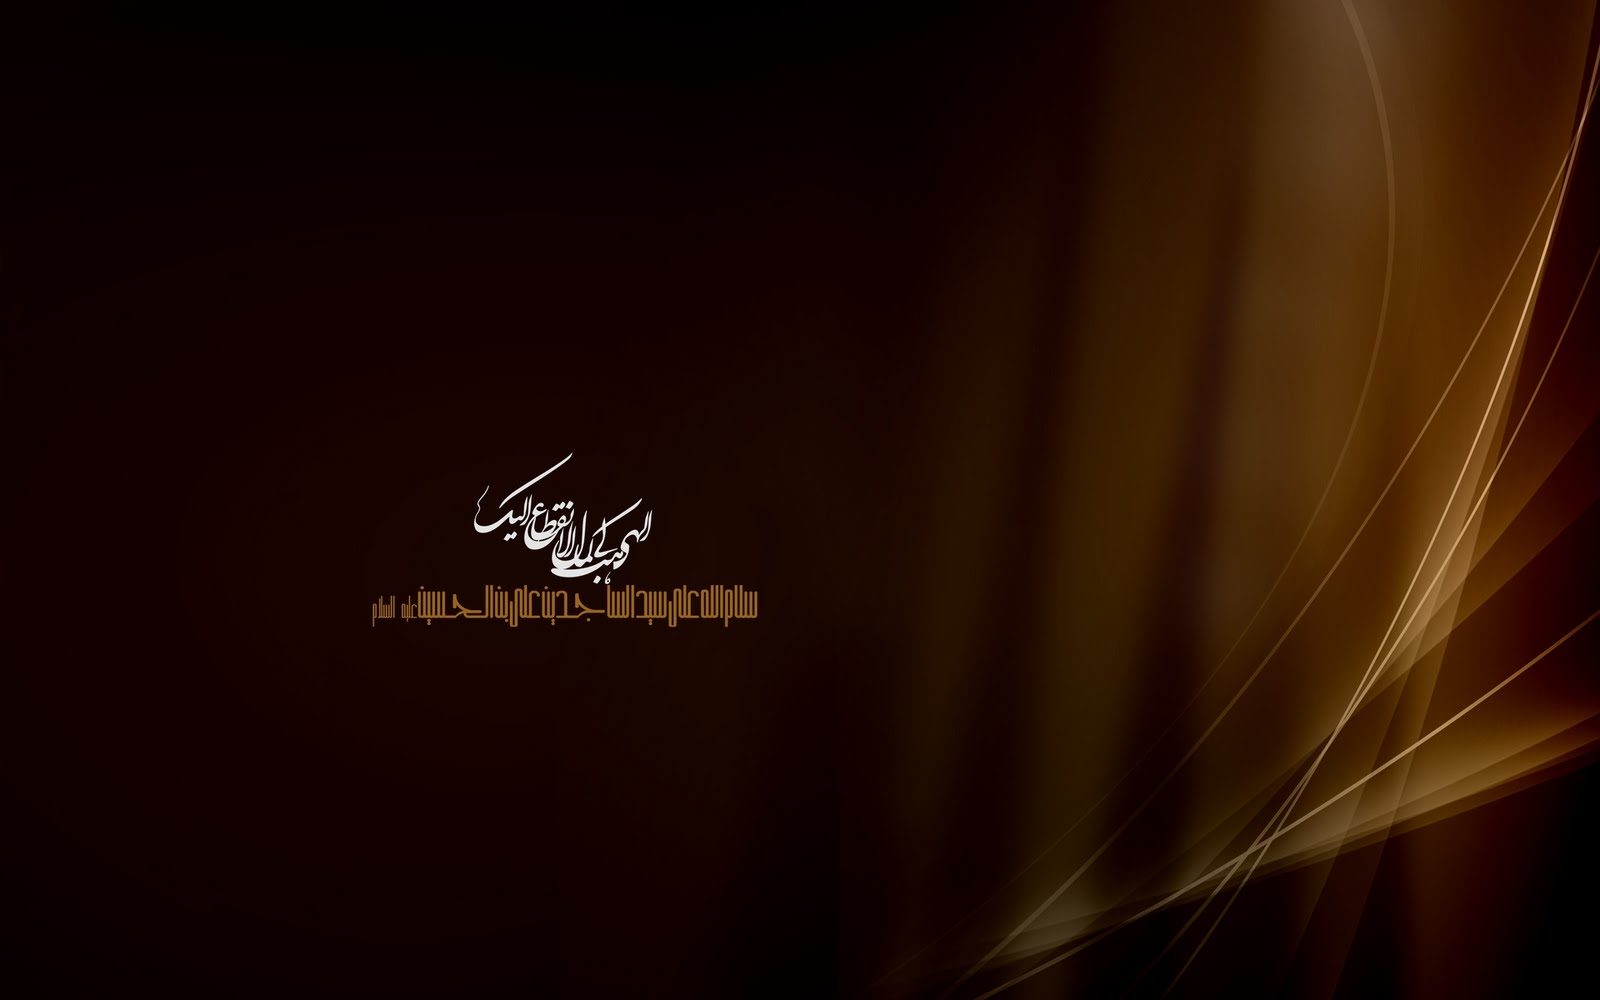 Islamic Hd Wallpapers 1080p 1600x1000